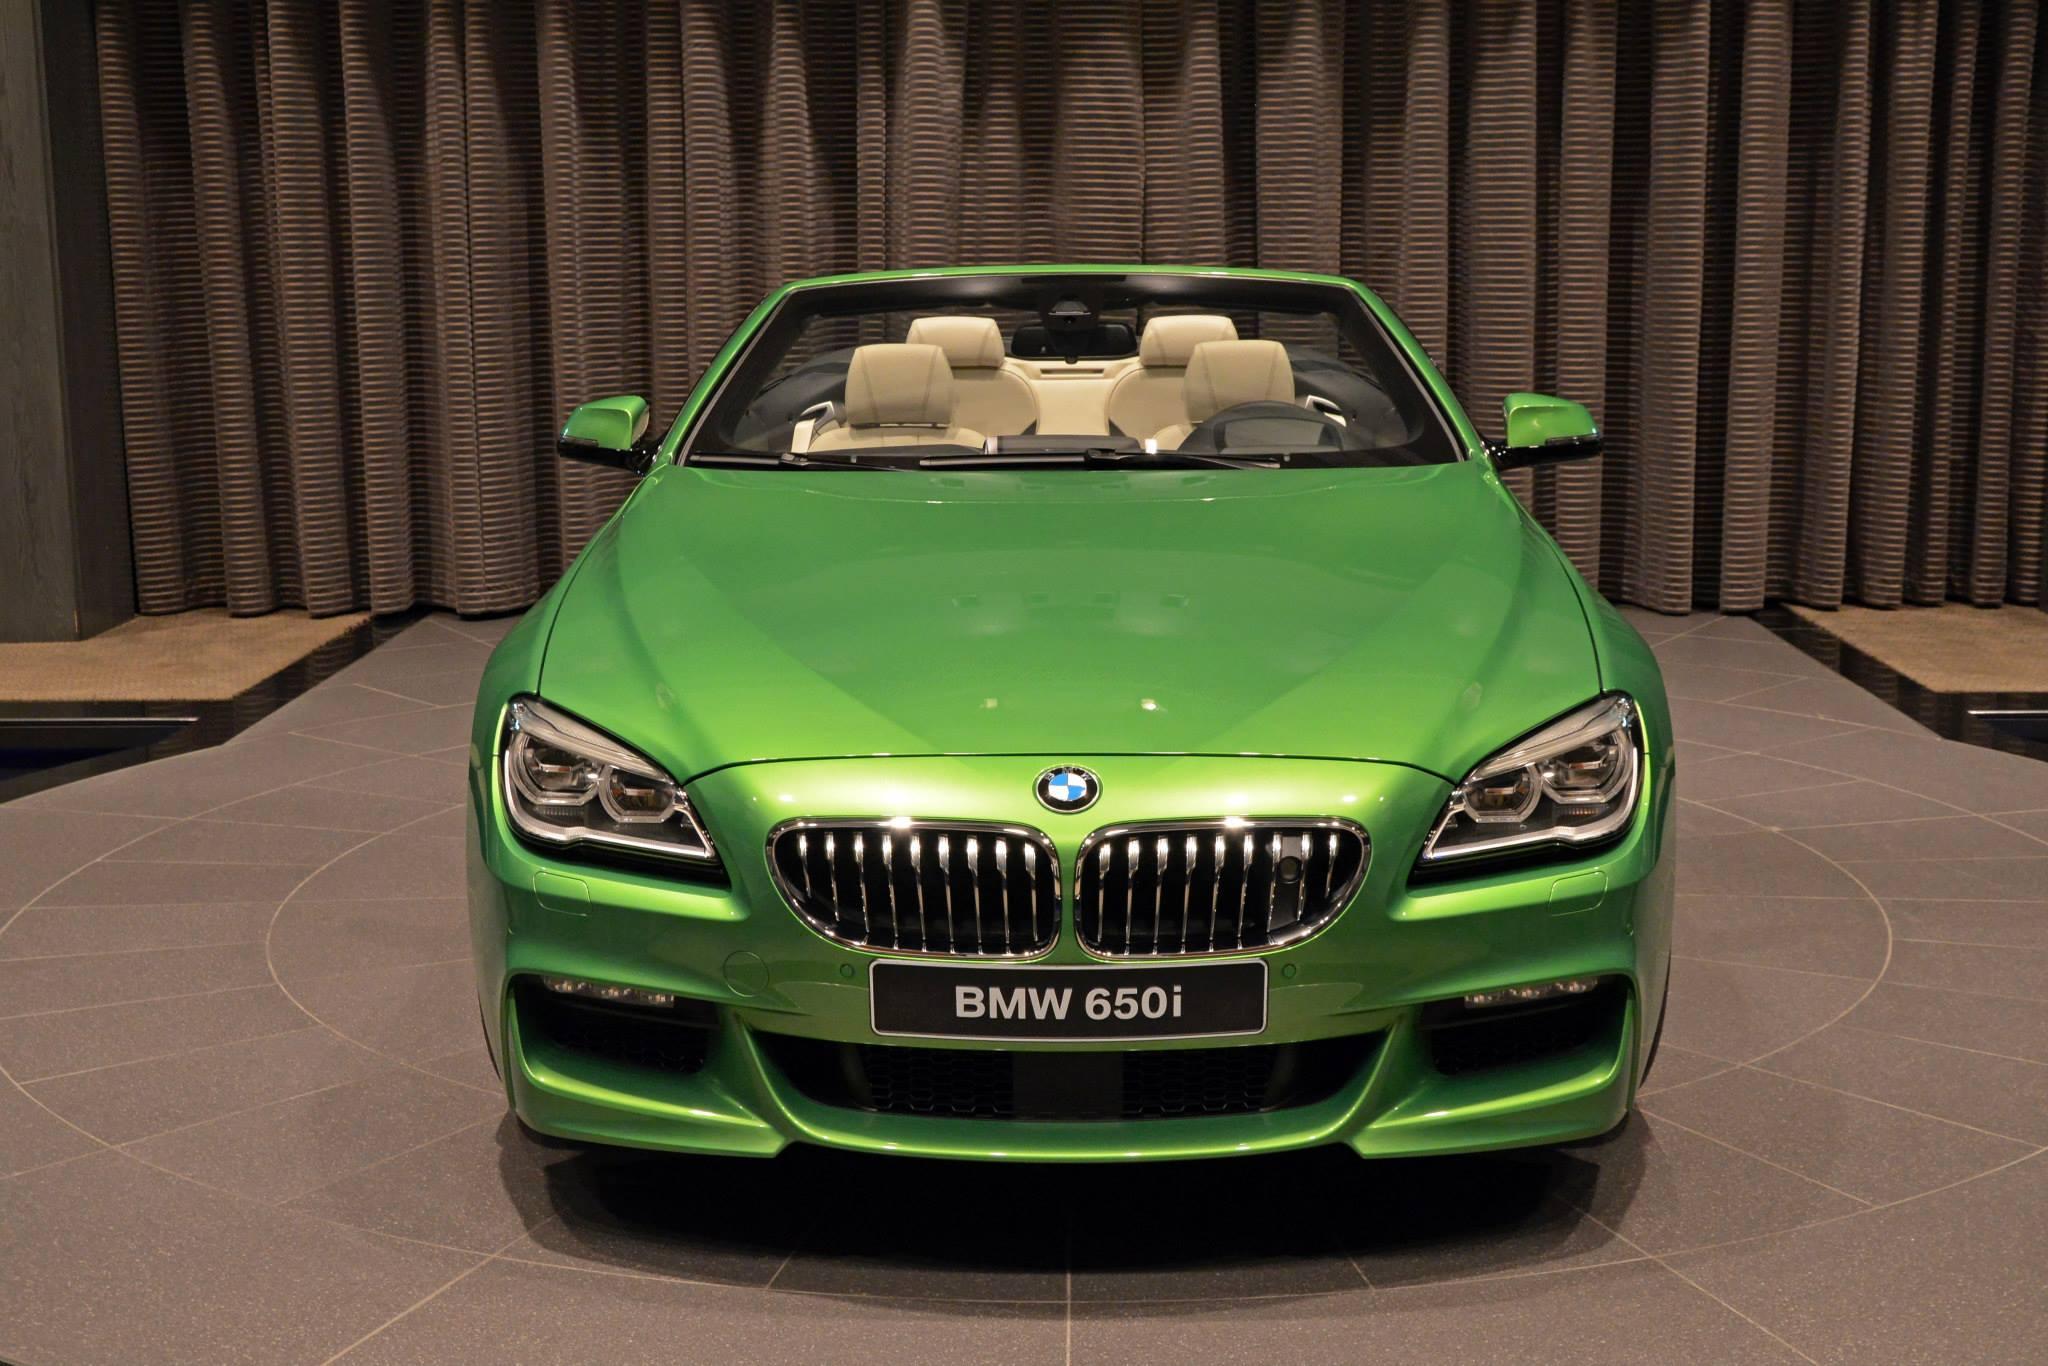 BMW 6er Cabrio Java Gruen Individual 650i F12 LCI 02